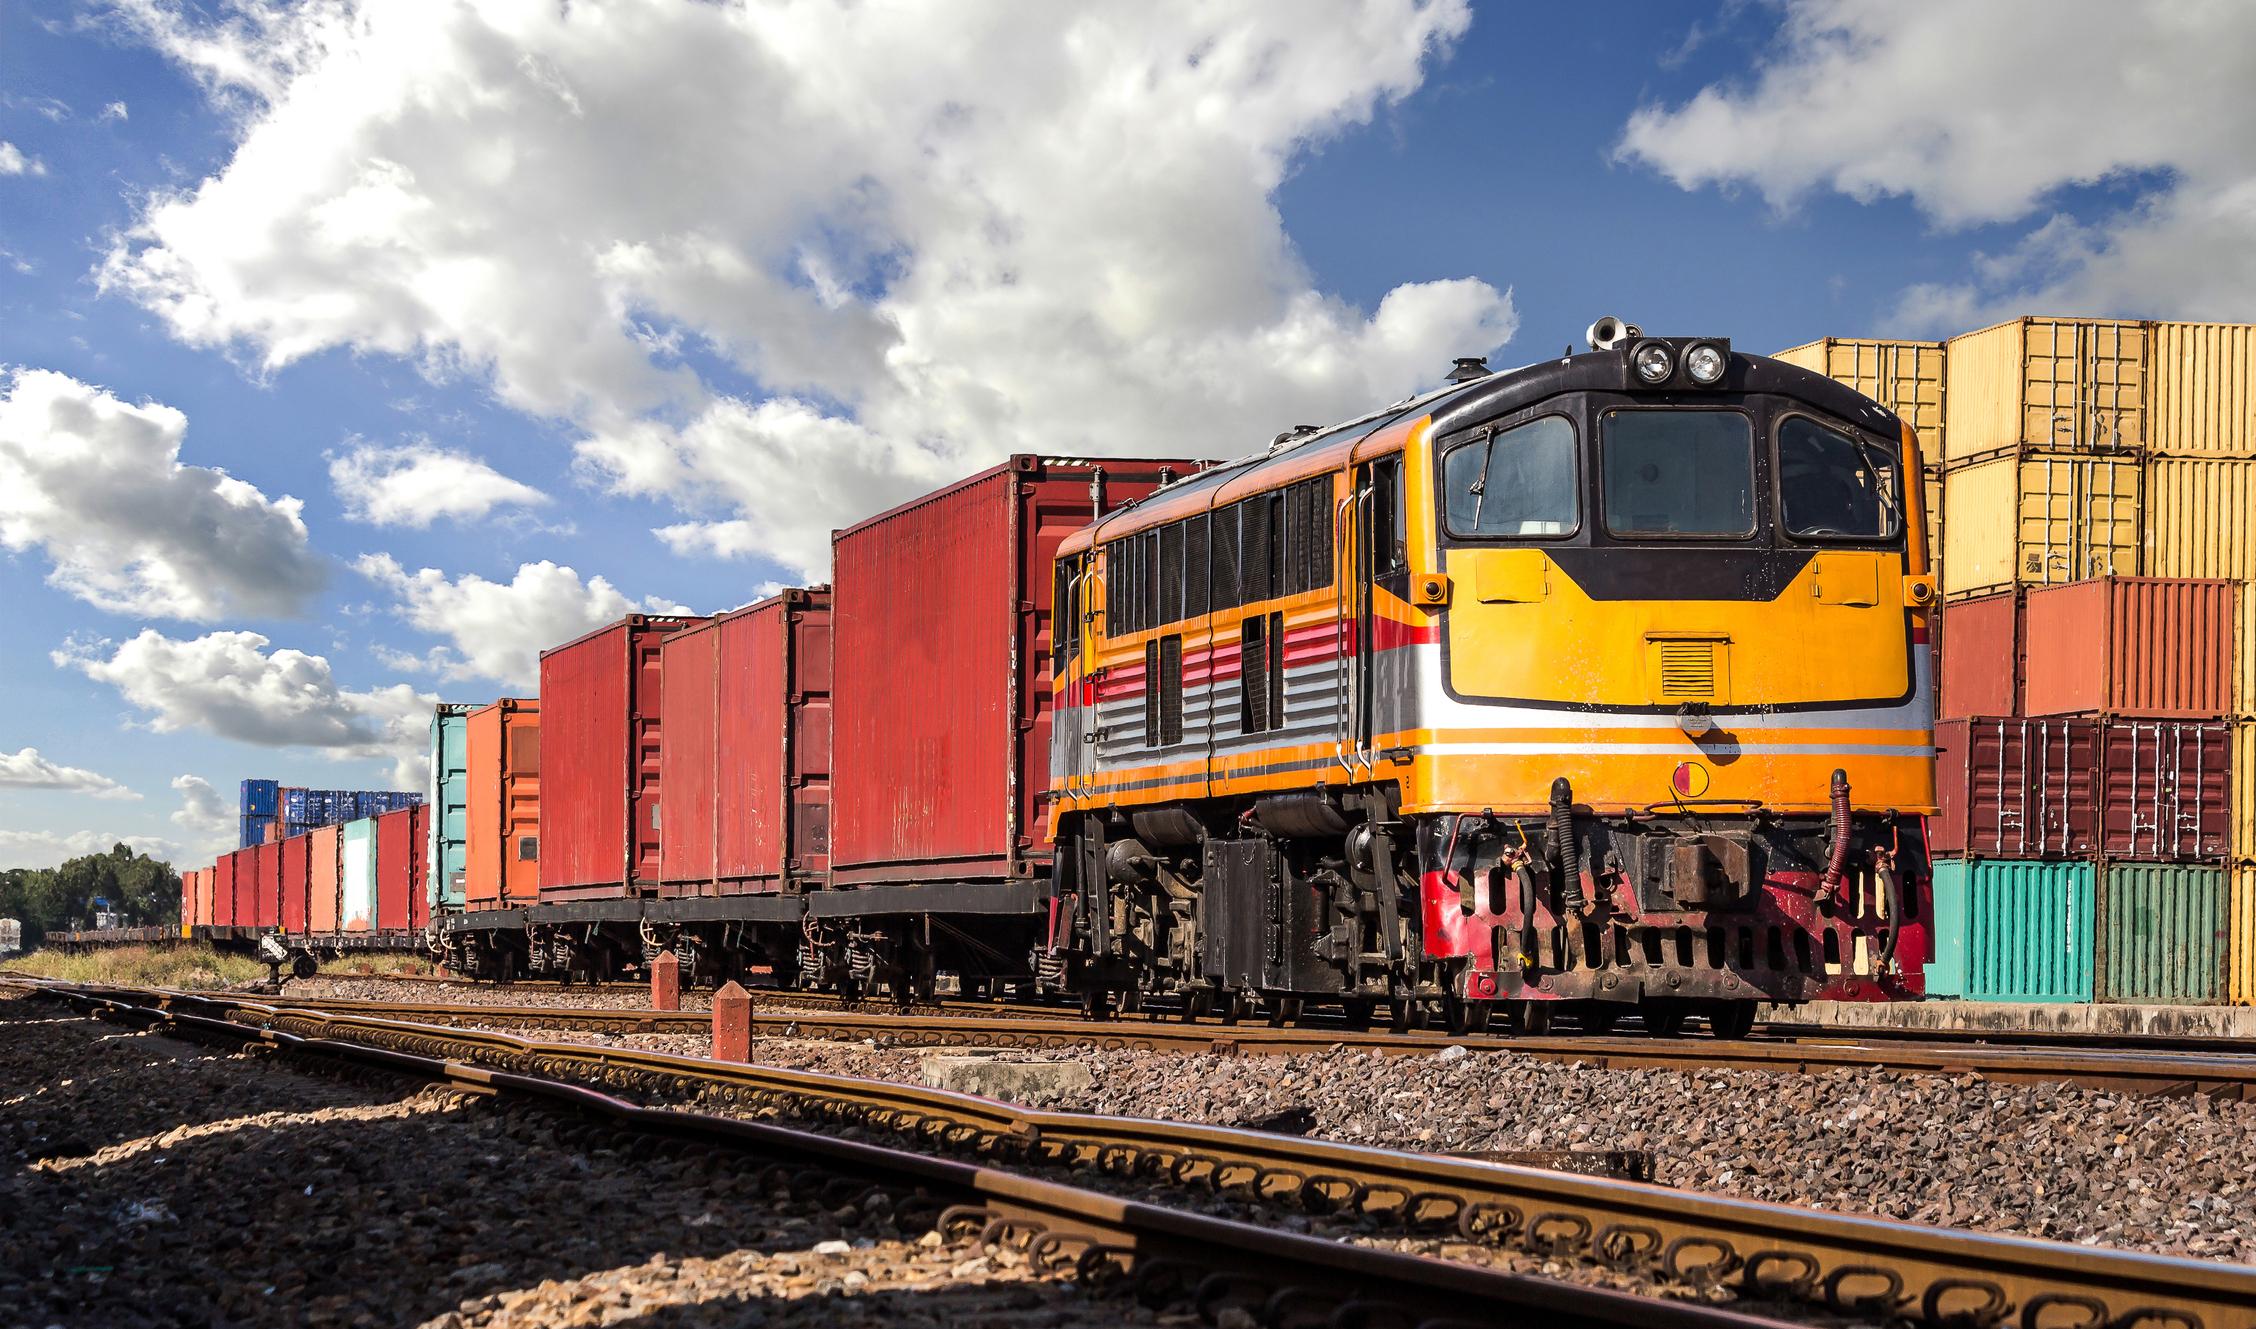 A train moving through an industrial area.